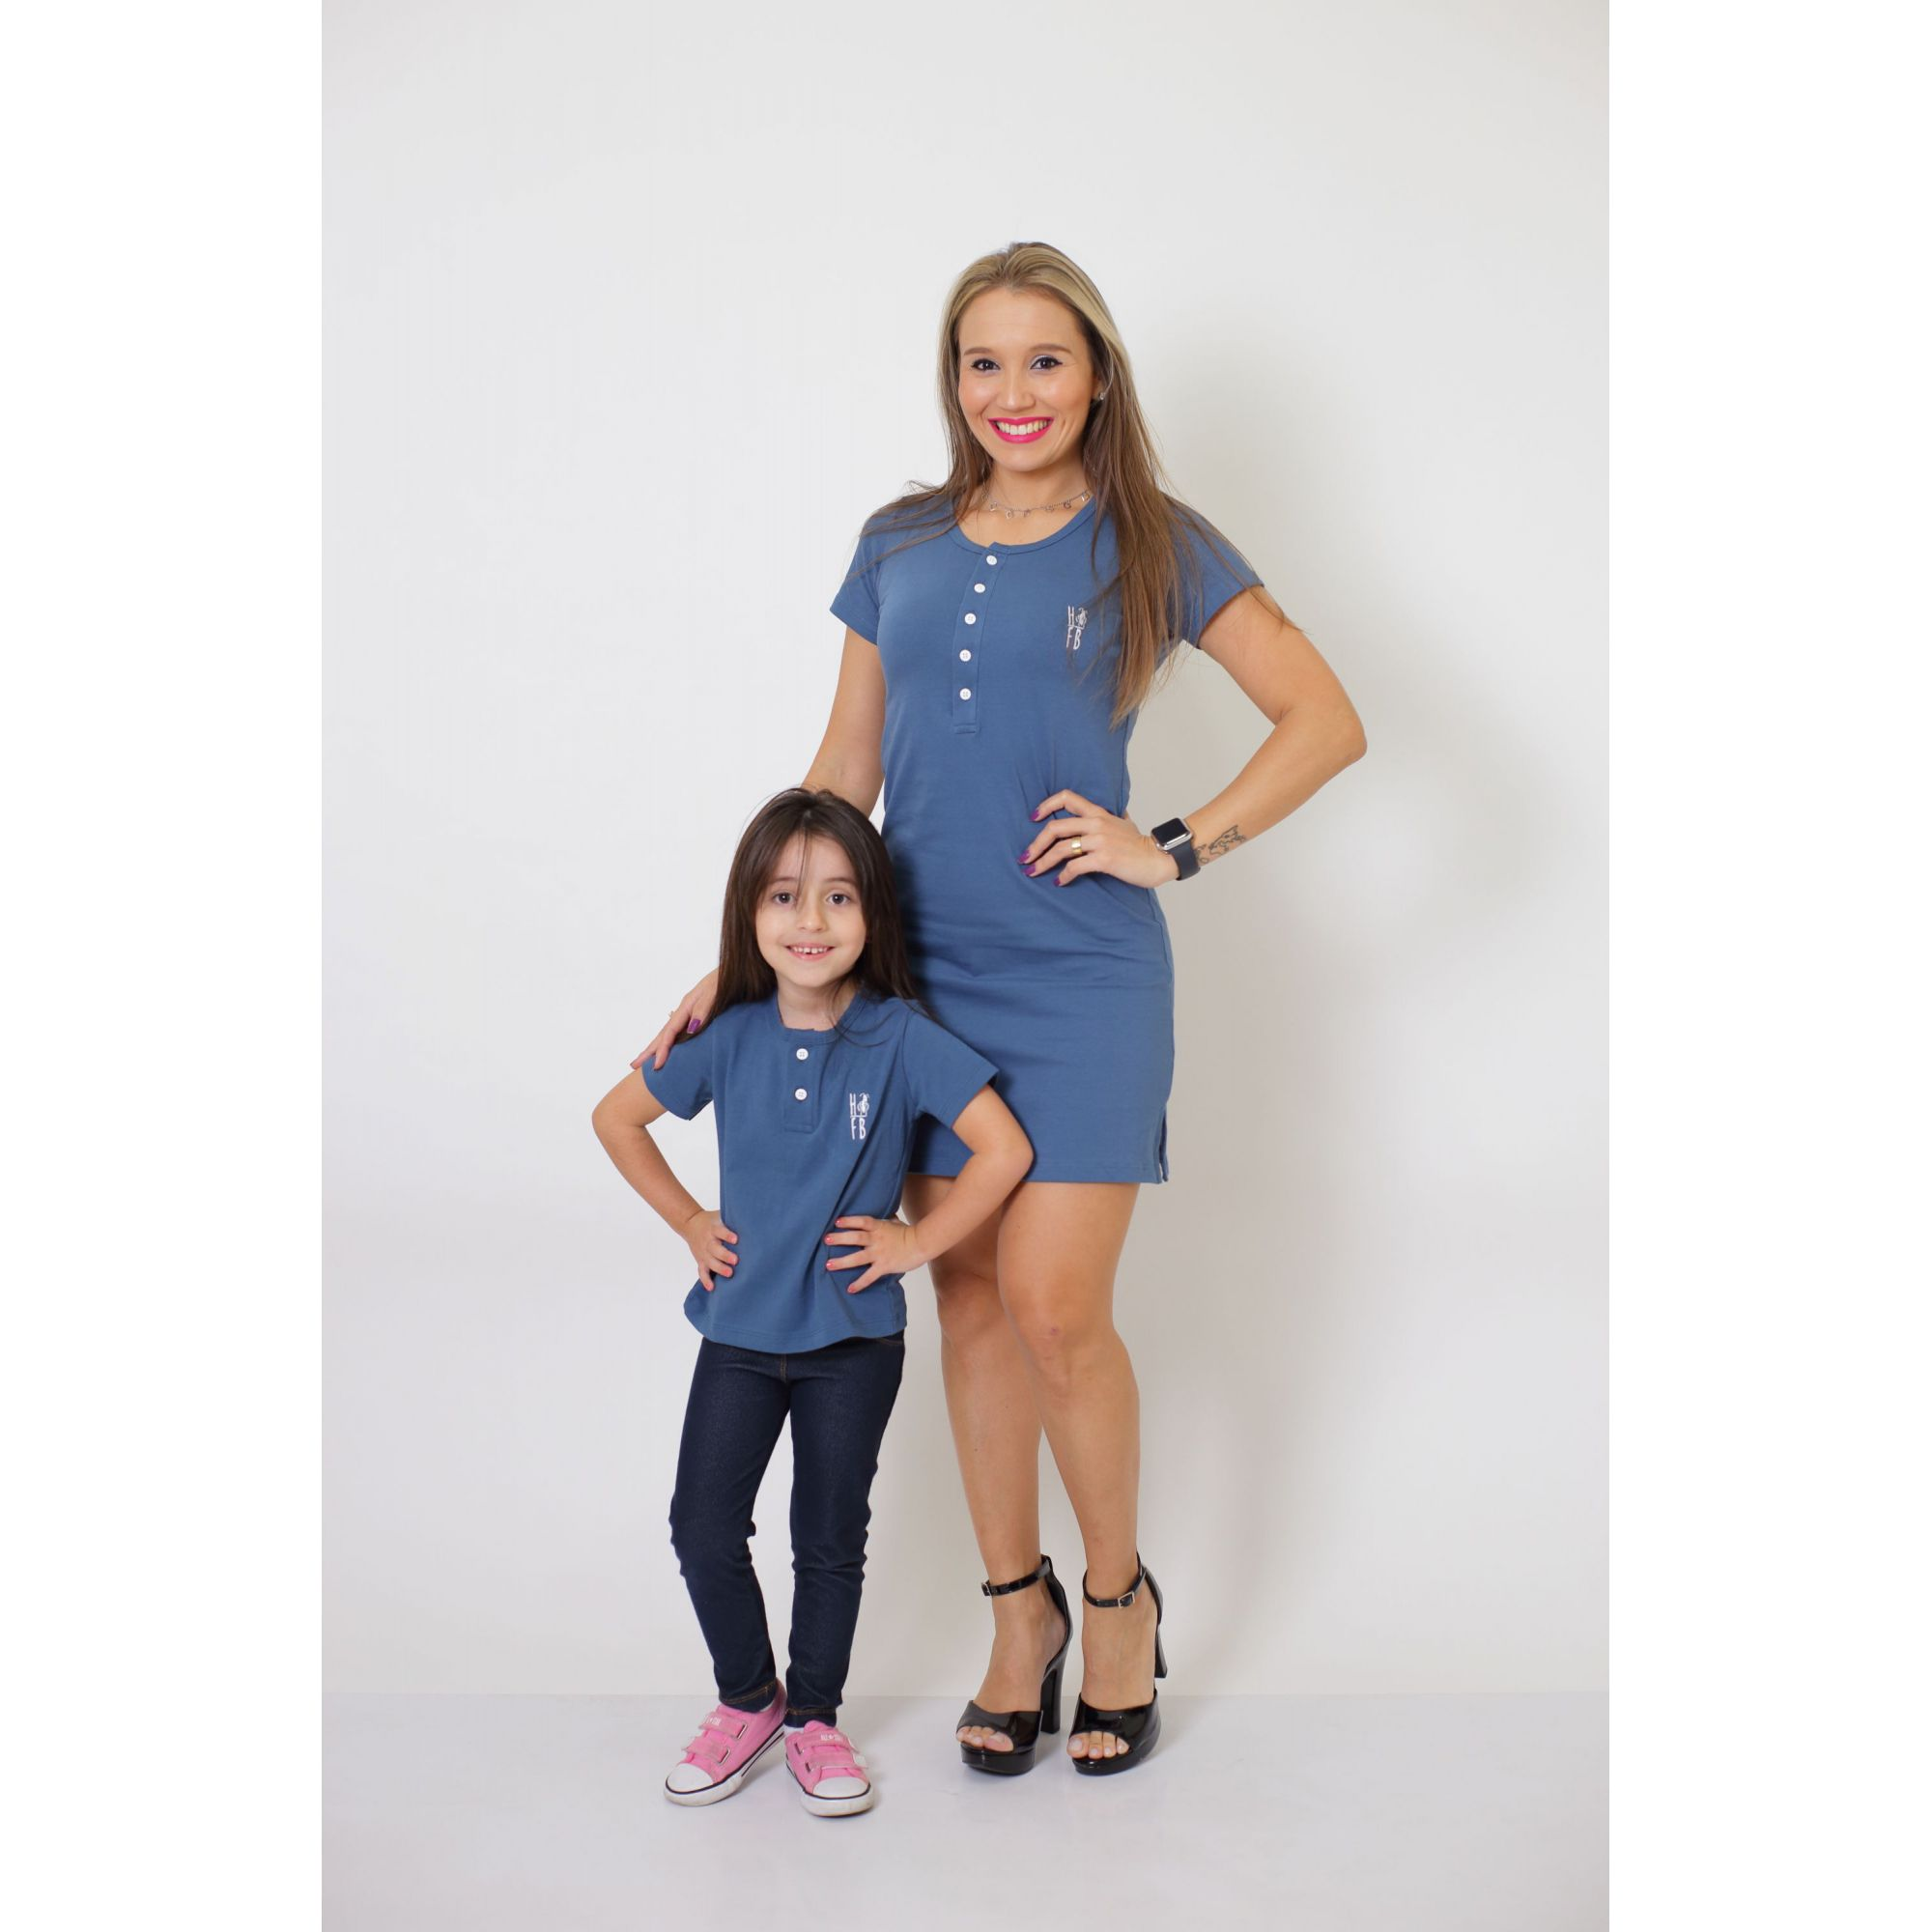 MÃE E FILHO > Kit Vestido + T-shirt Unissex ou Body Infantil - Henley - Azul Petróleo [Coleção Tal Mãe Tal Filho]  - Heitor Fashion Brazil